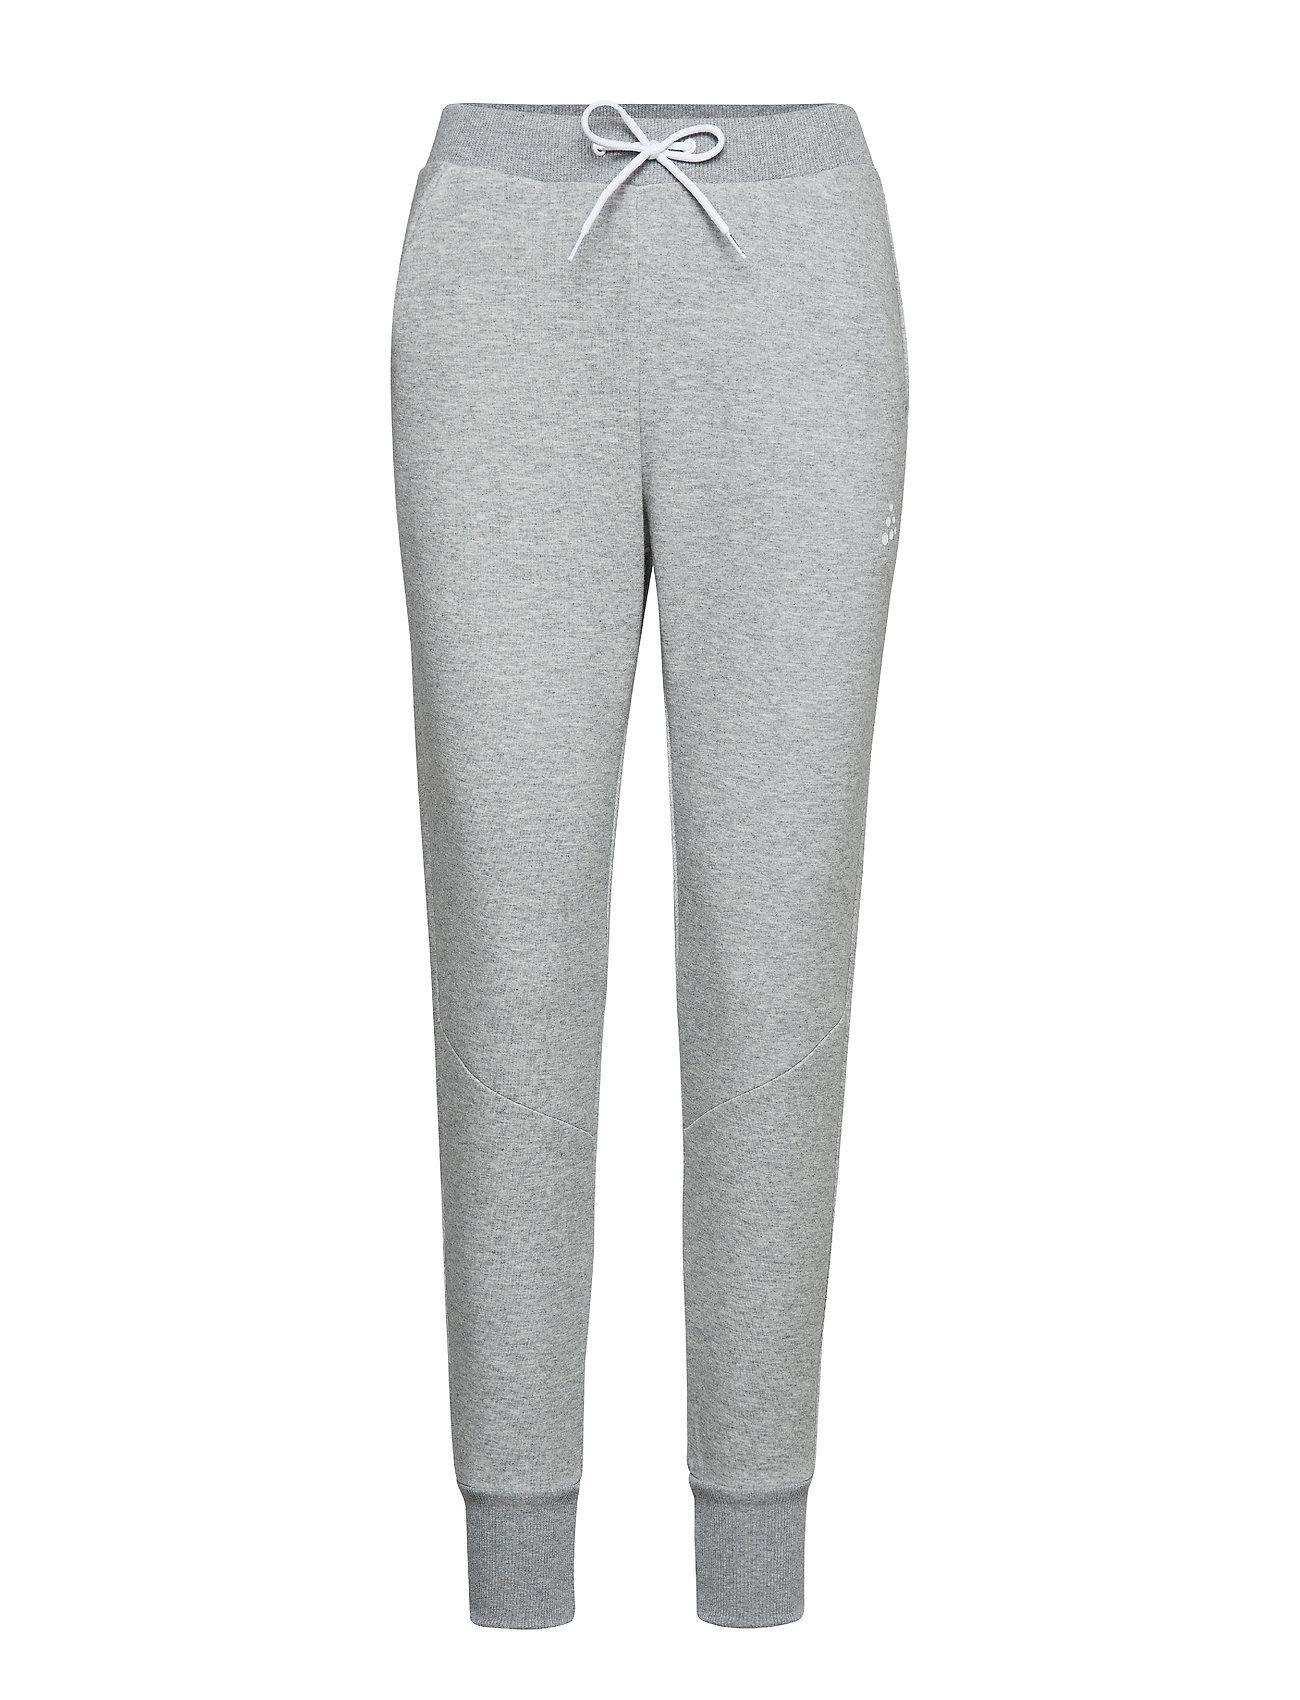 a196469c District Crotch Sweat Pants W (Grey Melange) (£30) - Craft -   Boozt.com